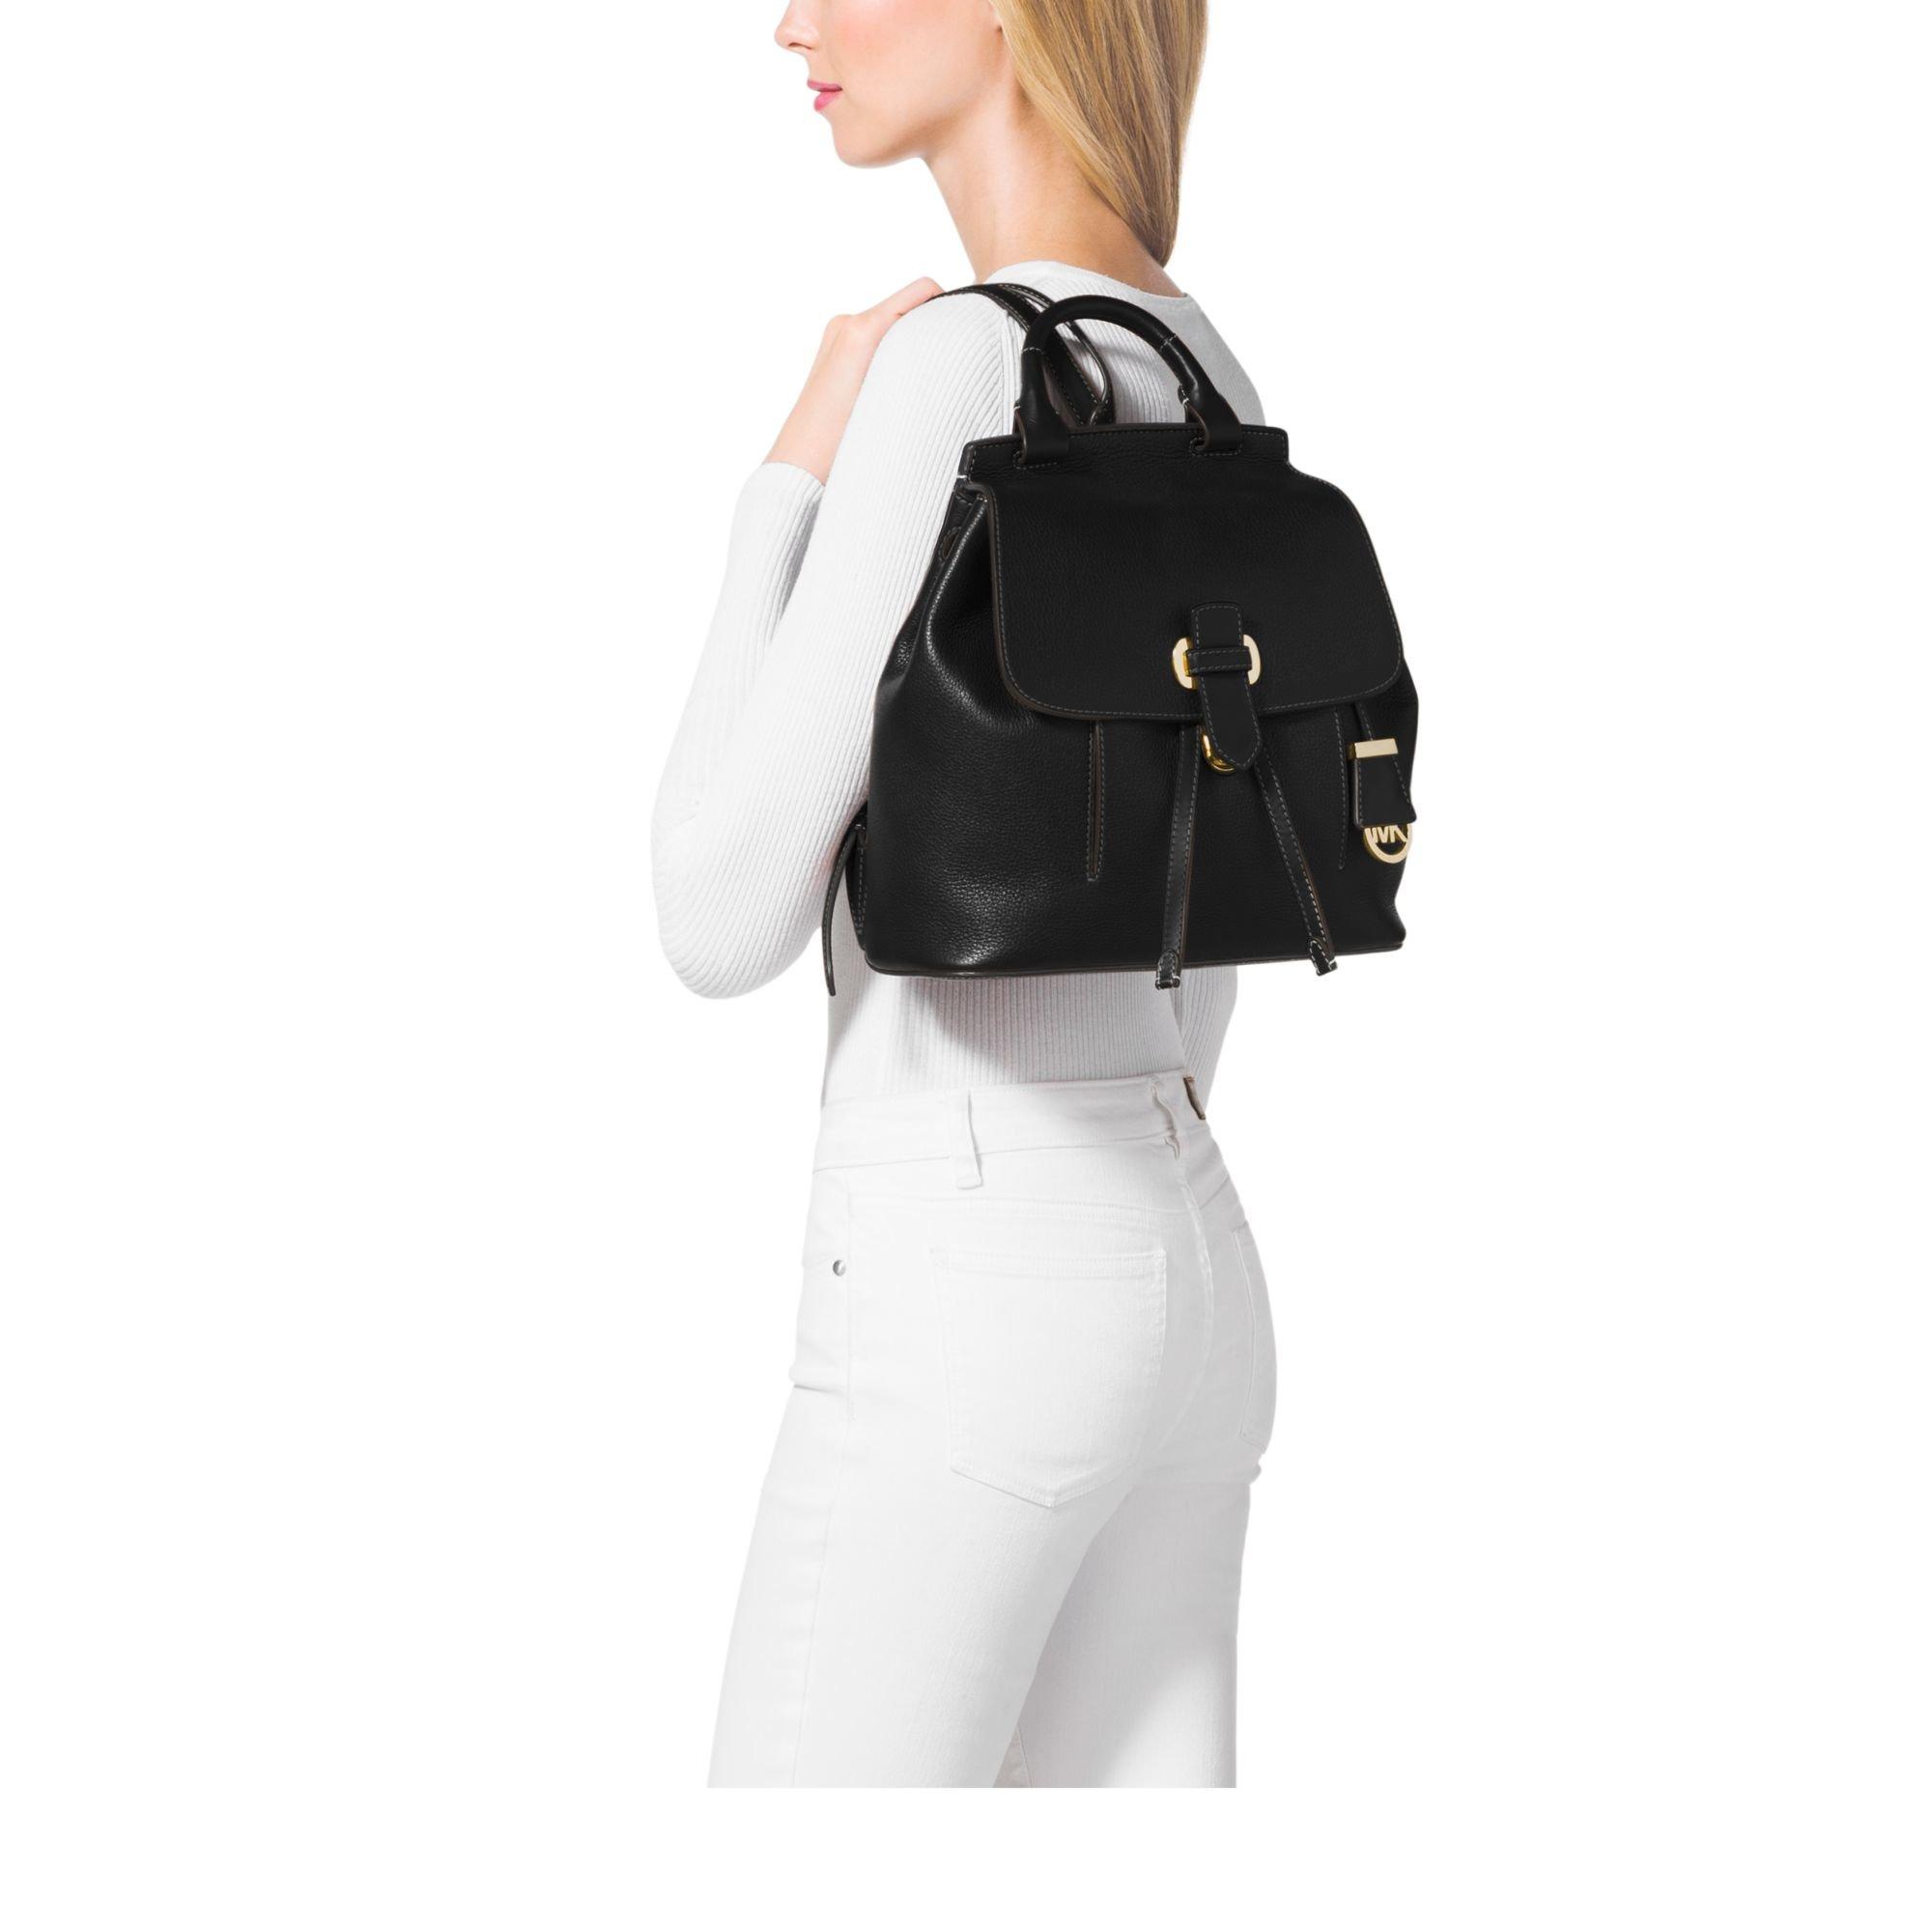 f5d208fd9560 ... reduced lyst michael kors romy medium leather backpack in black 43cd7  187d9 ...